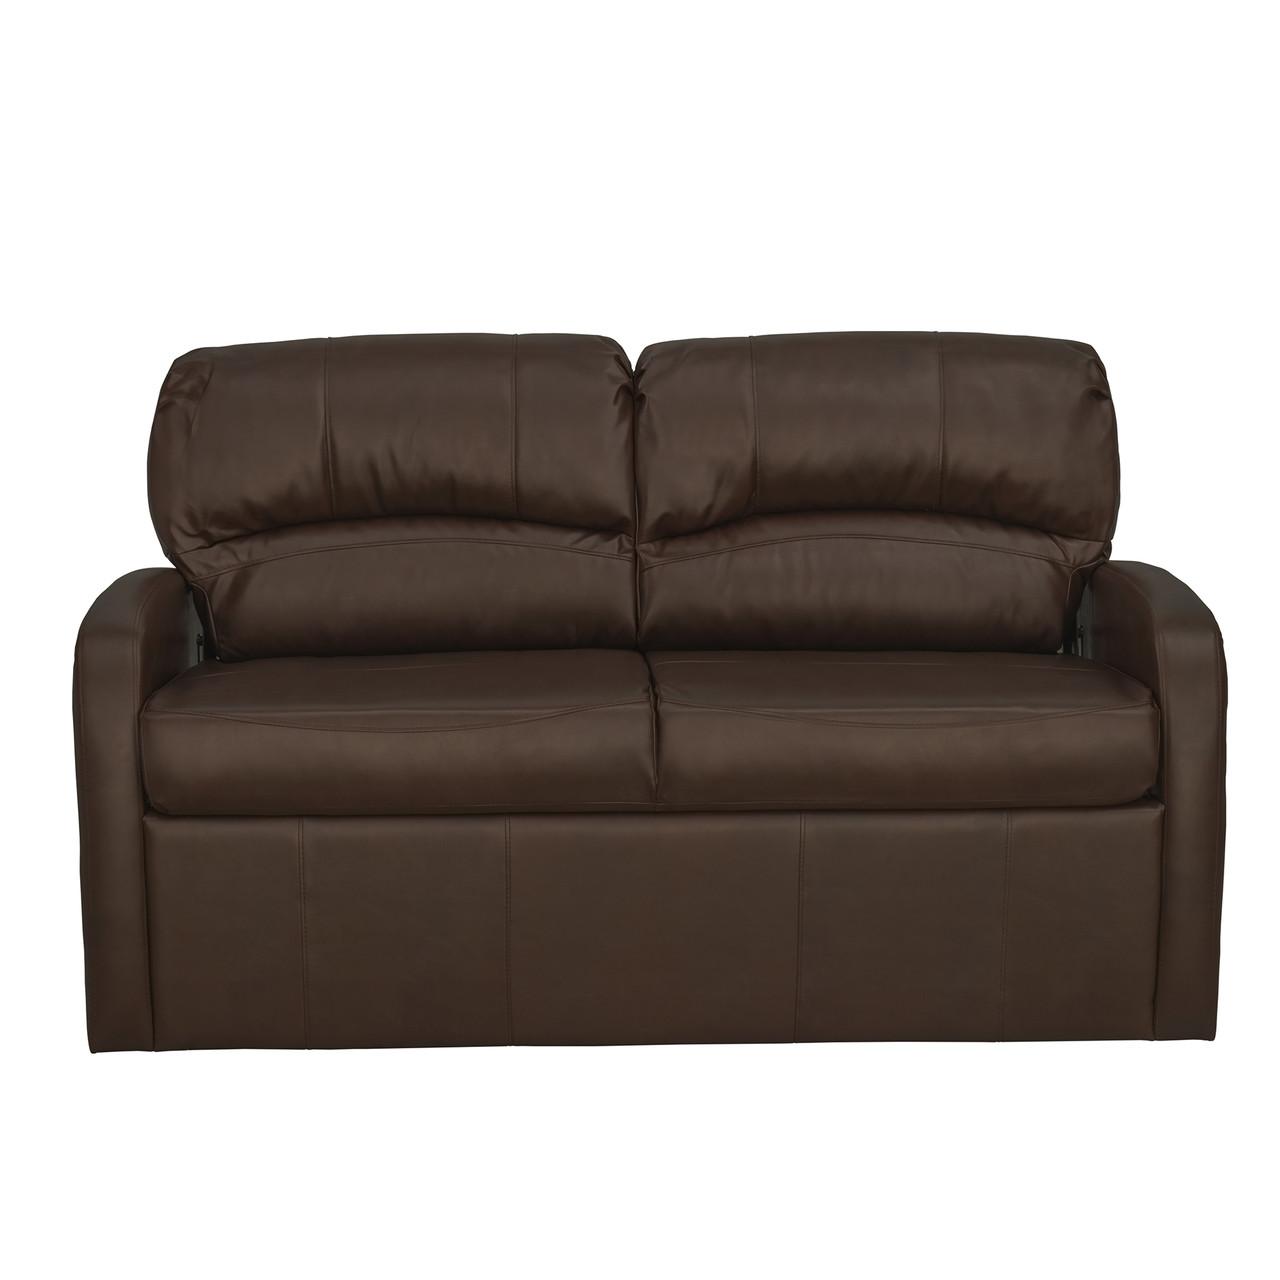 sofa sleeper for camper bespoke edinburgh recpro charles 70 quot jack knife rv furniture